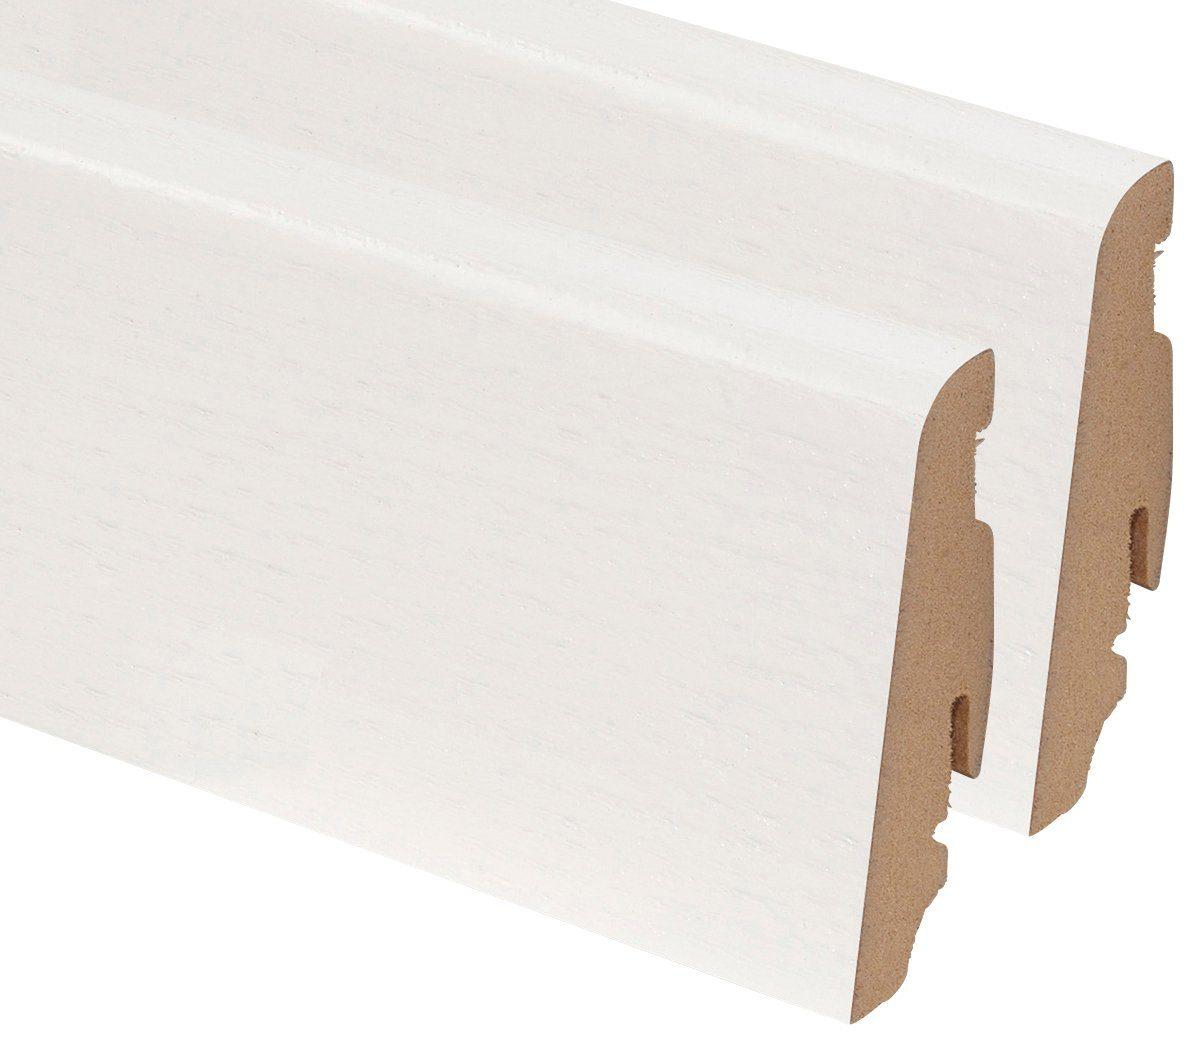 BODENMEISTER Set: Sockelleiste »Echholz Esche weiß«, 2er-Pack, Höhe: 5,8 cm